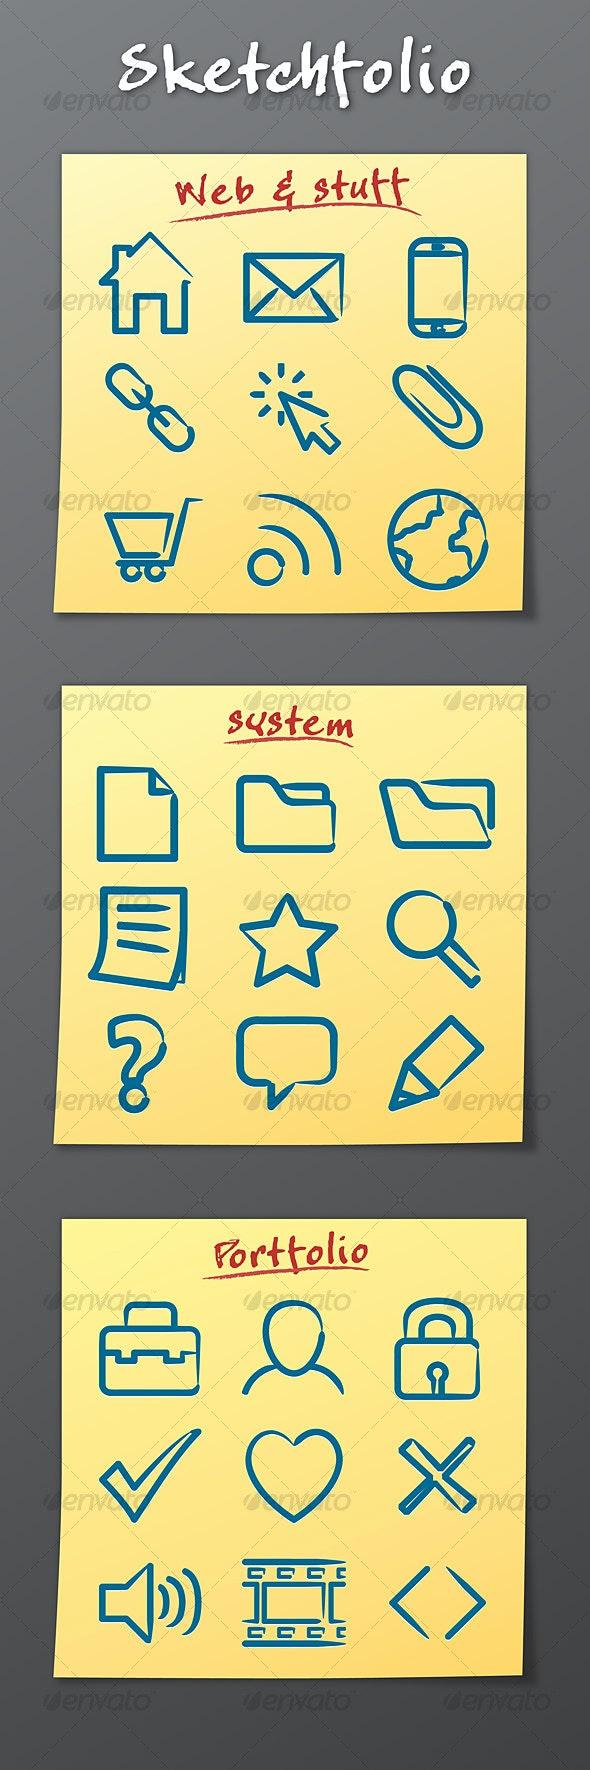 Sketchfolio Icons - Web Icons